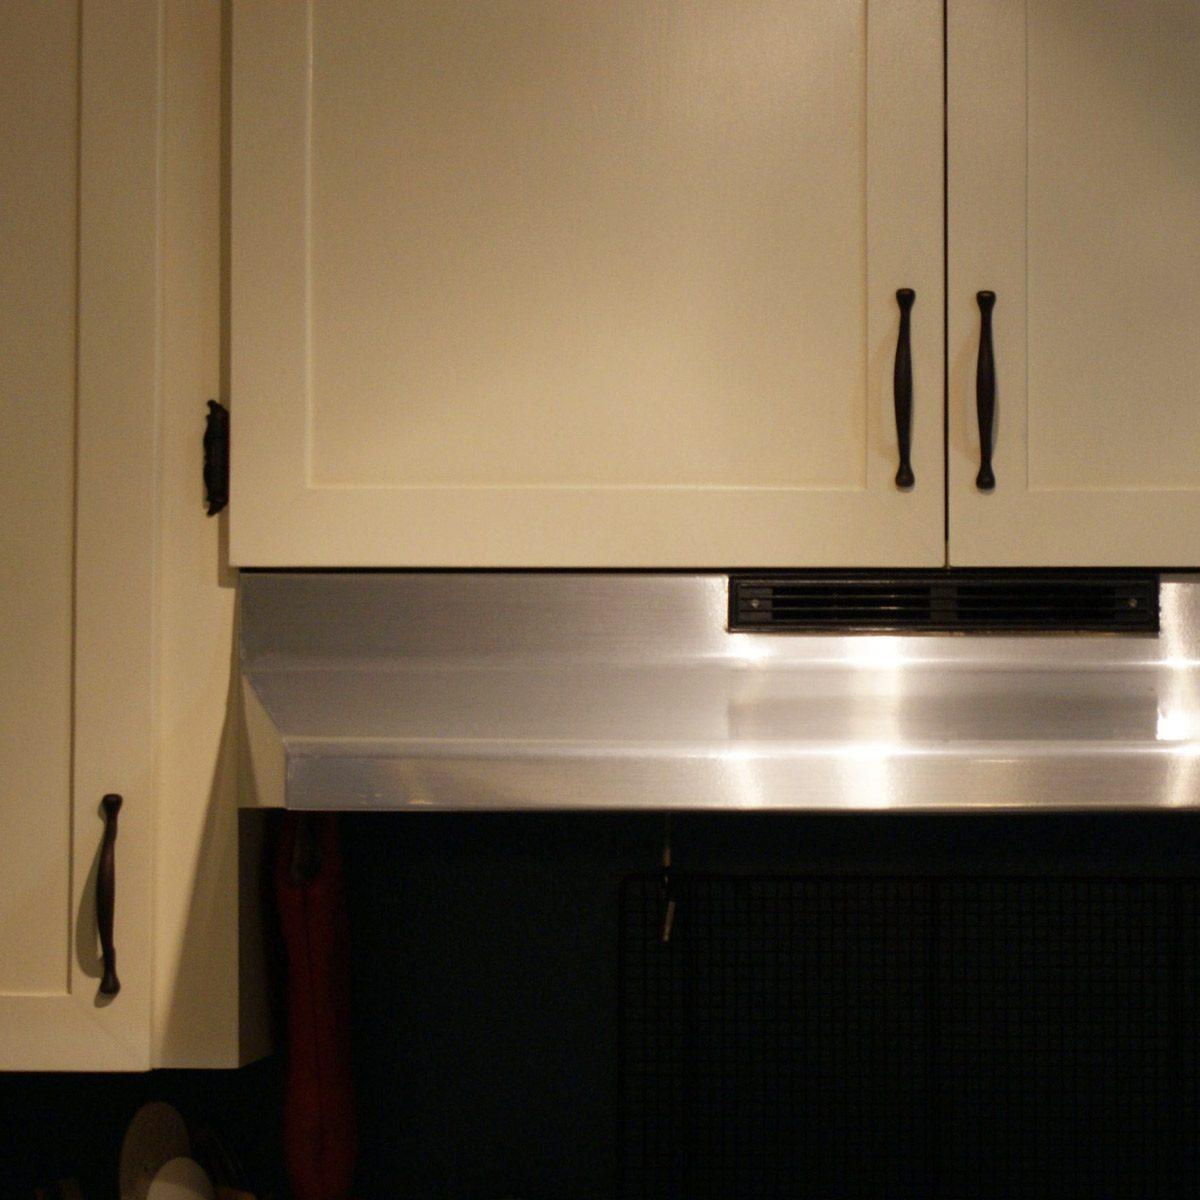 Stainless steel faux range hood